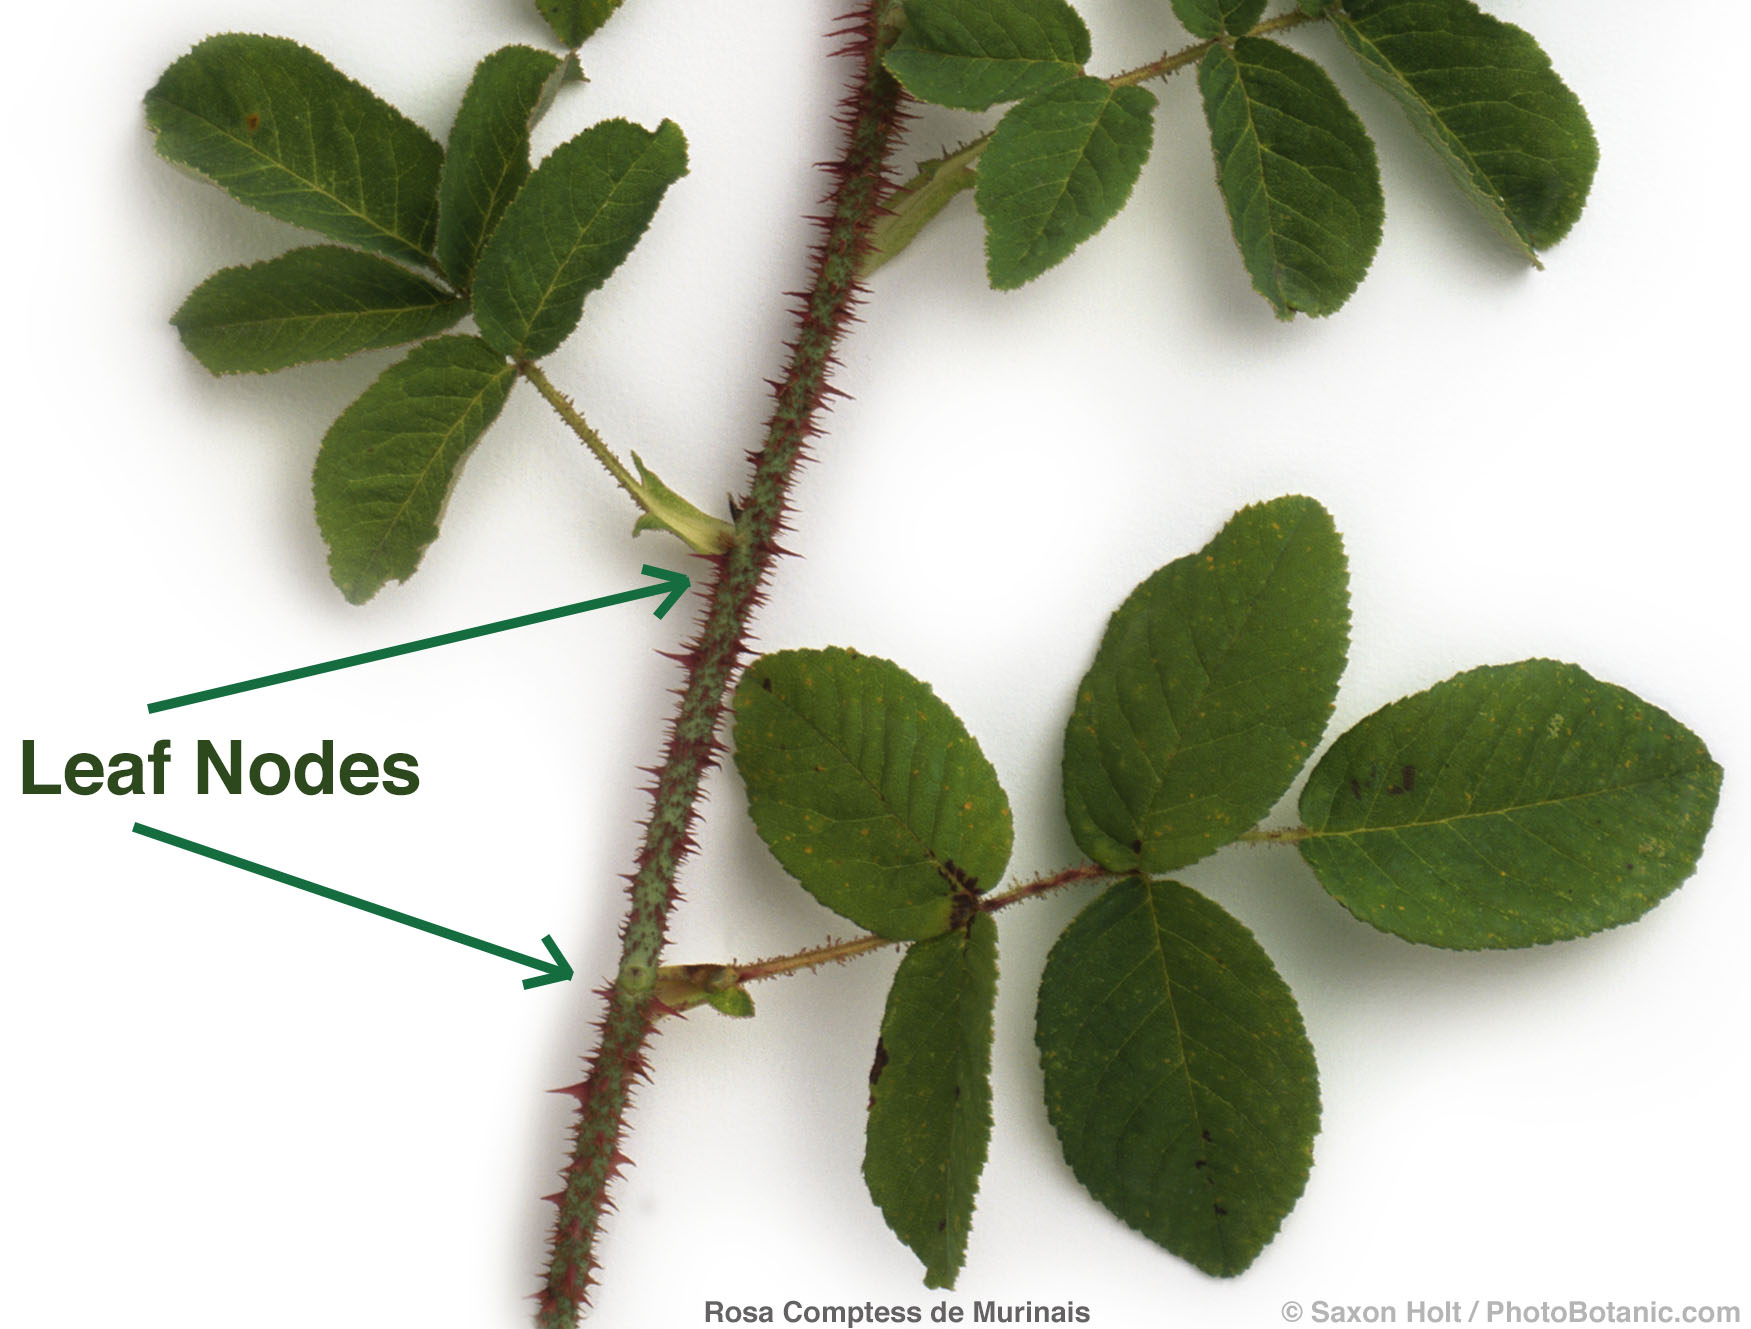 Smith & Hawken botanic illustration of leaf nodes - rose Comptess de Murinais